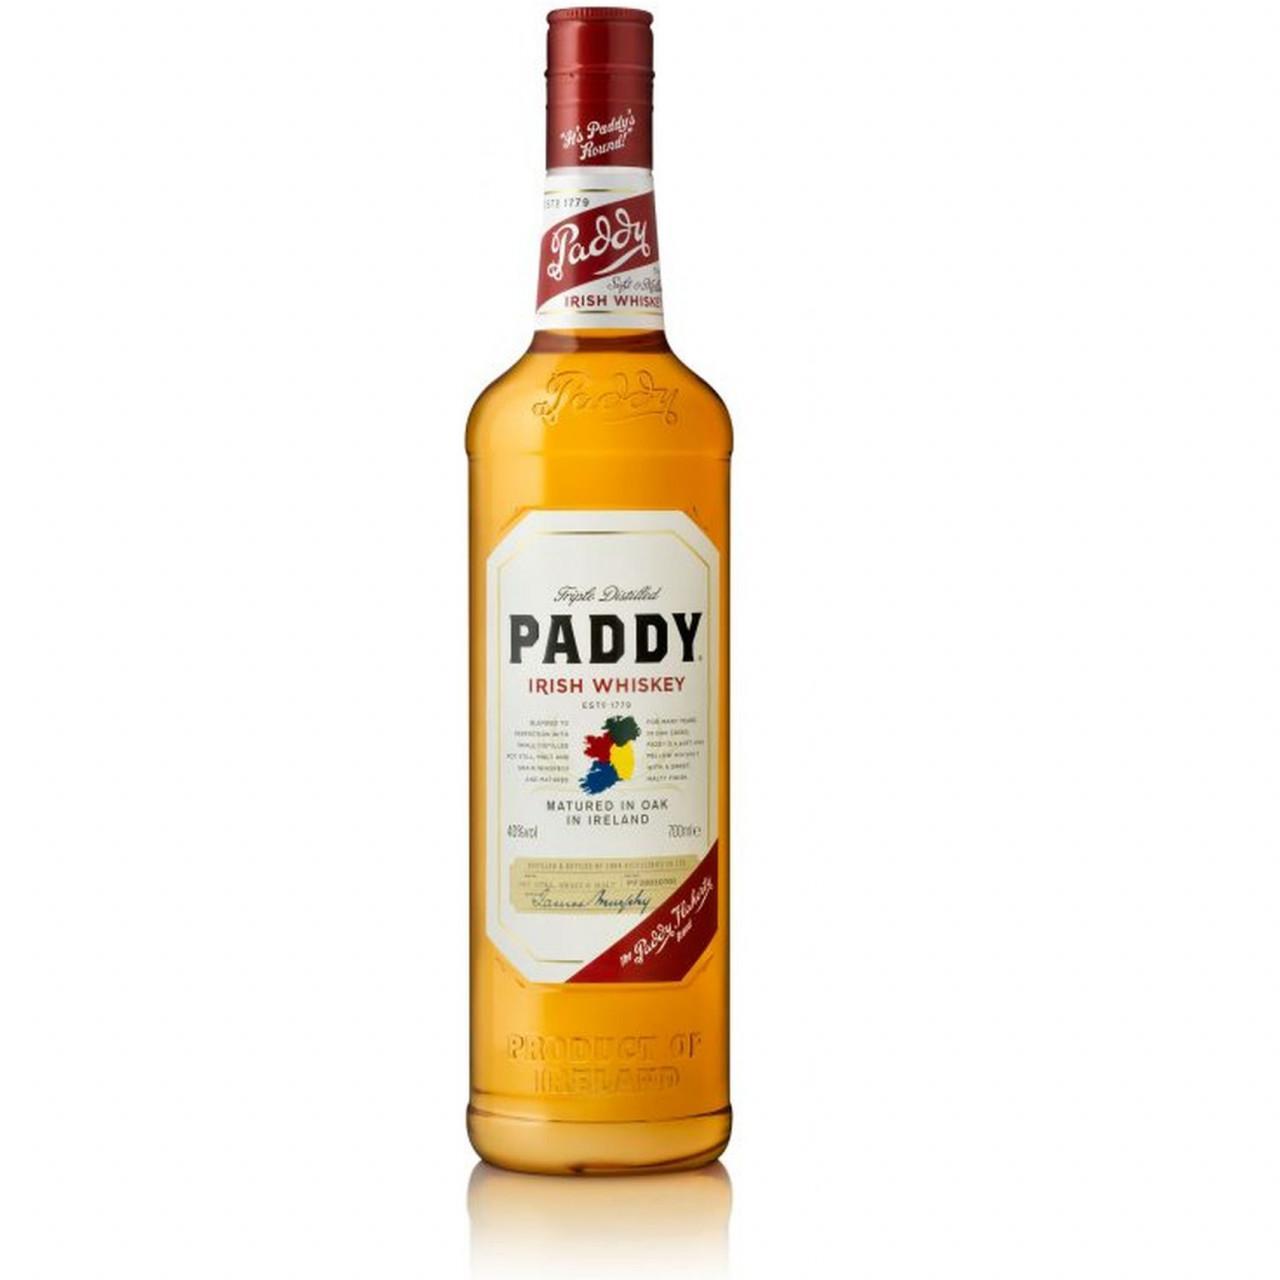 Paddy Irish Whiskey 40% 0,7l